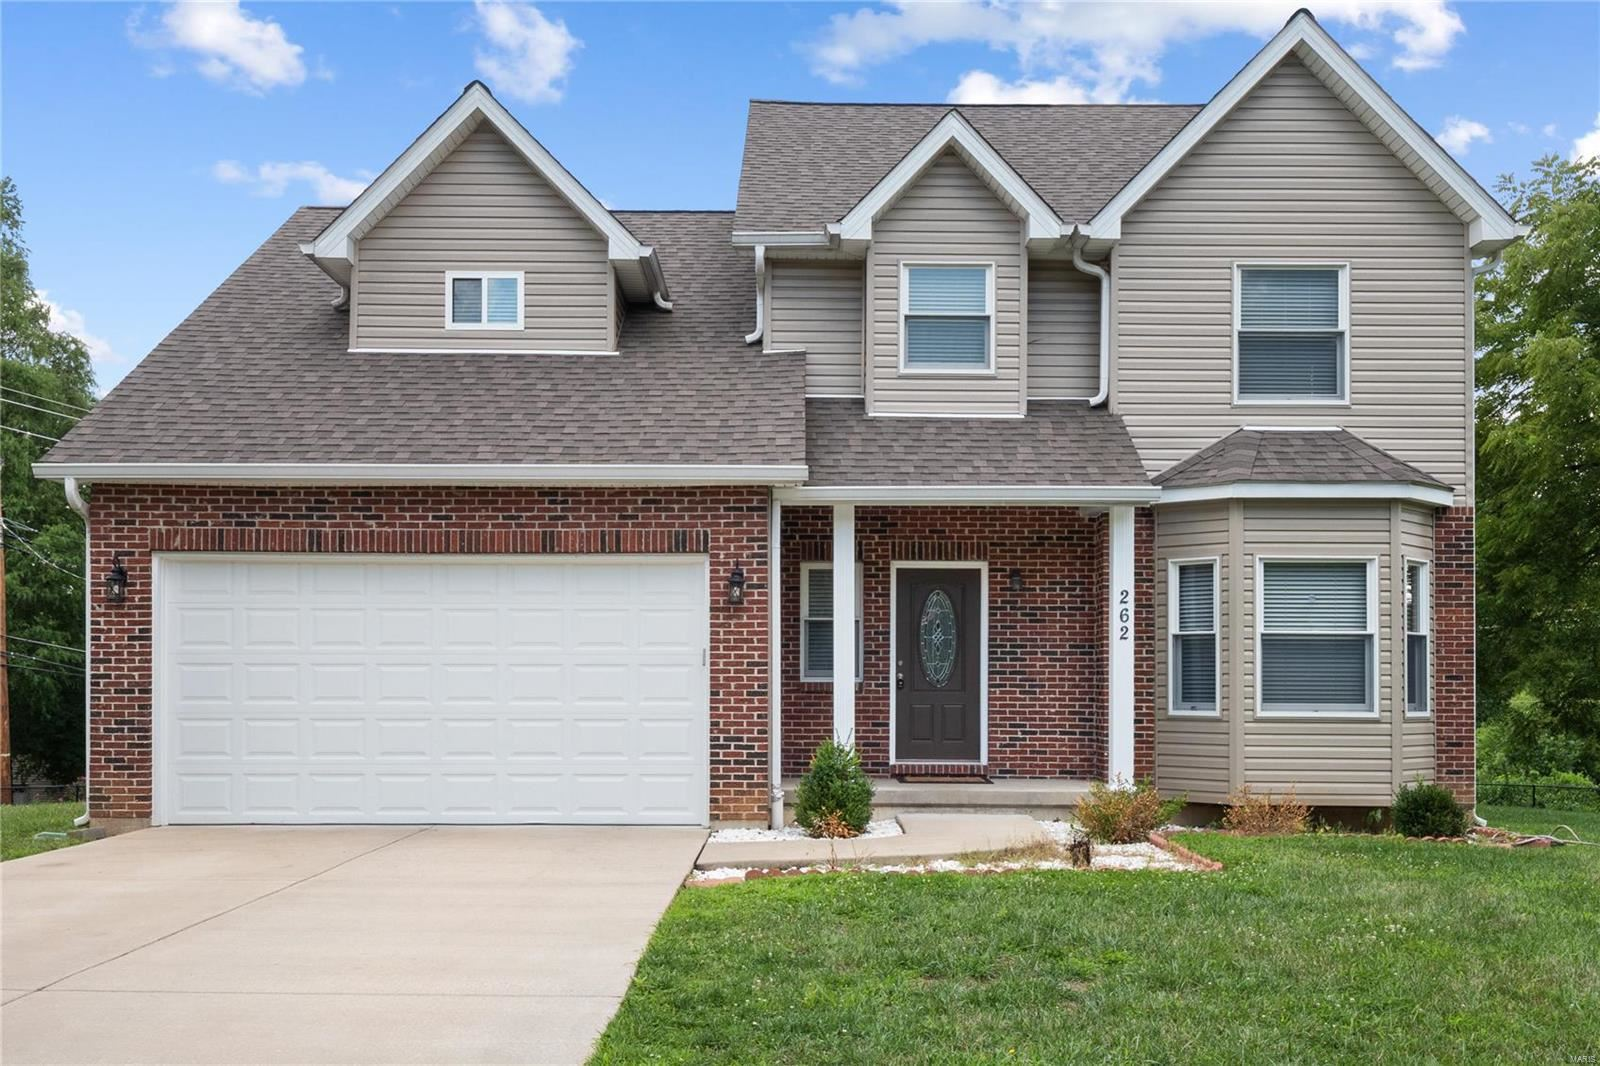 Ballwin Mo Homes For Rent Berkshire Hathaway Homeservices Alliance Realtors Berkshire Hathaway Homeservices